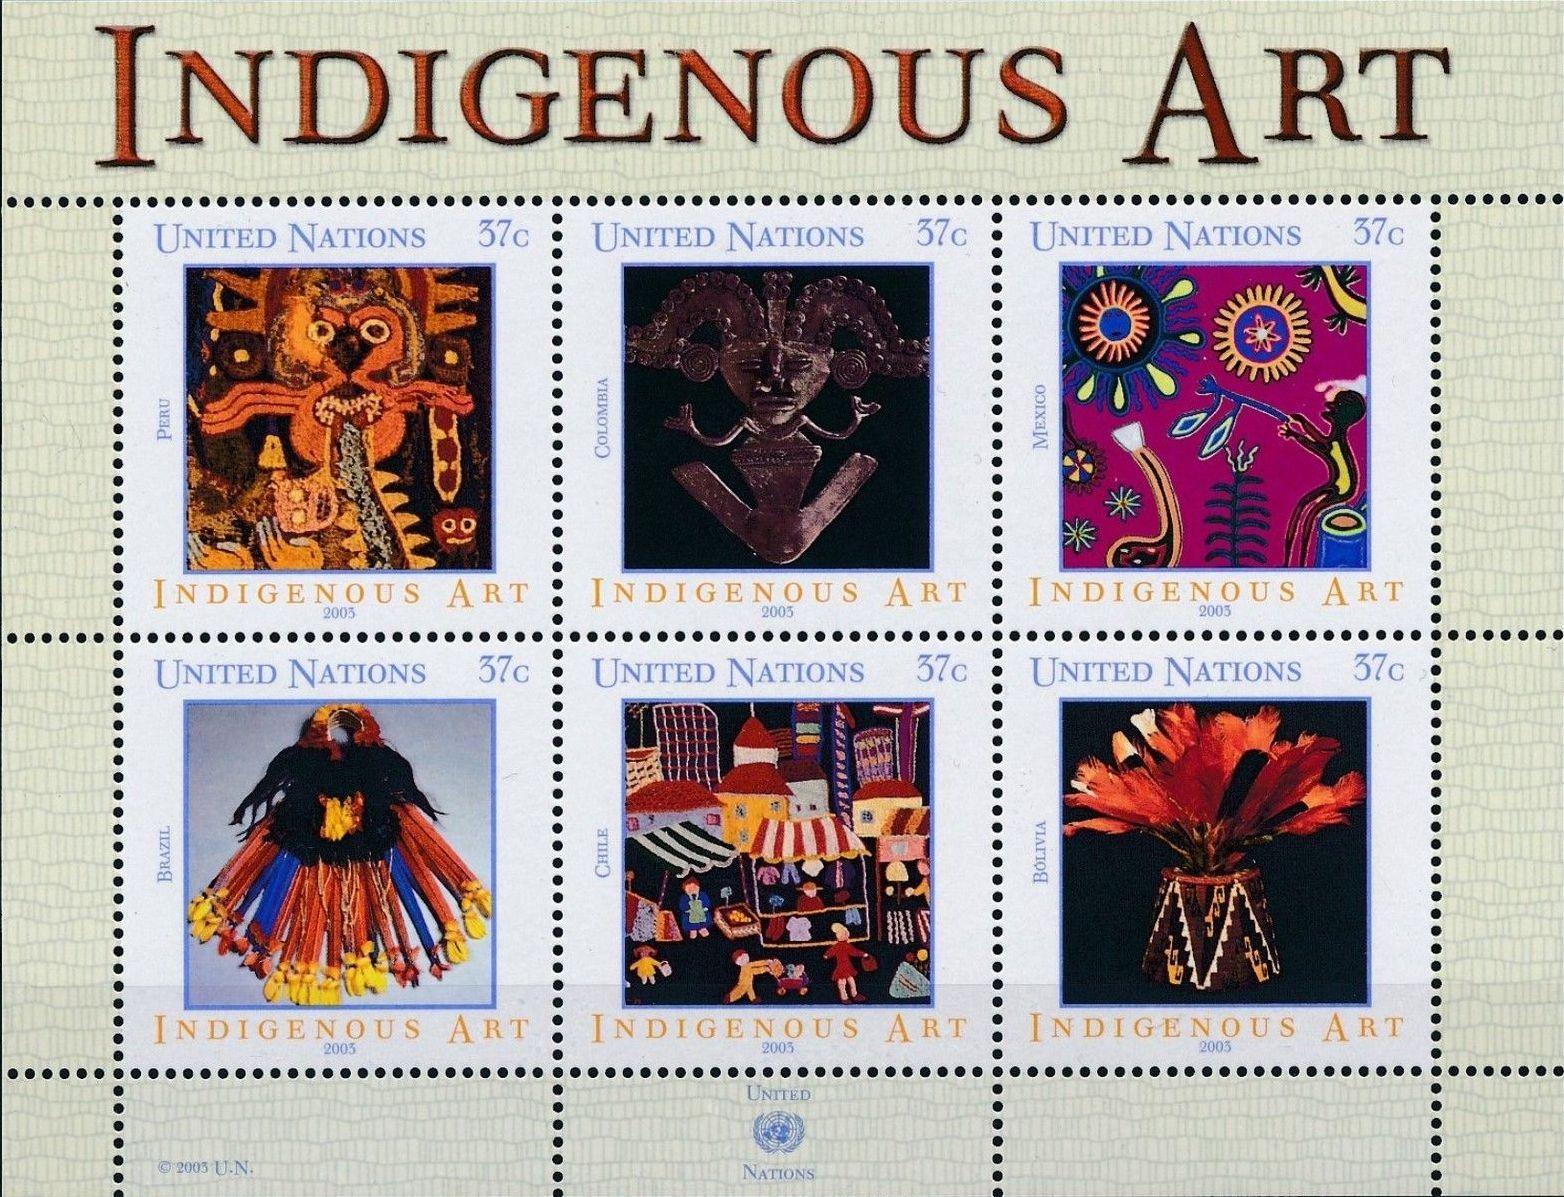 United Nations-New York 2003 Indigenous Art